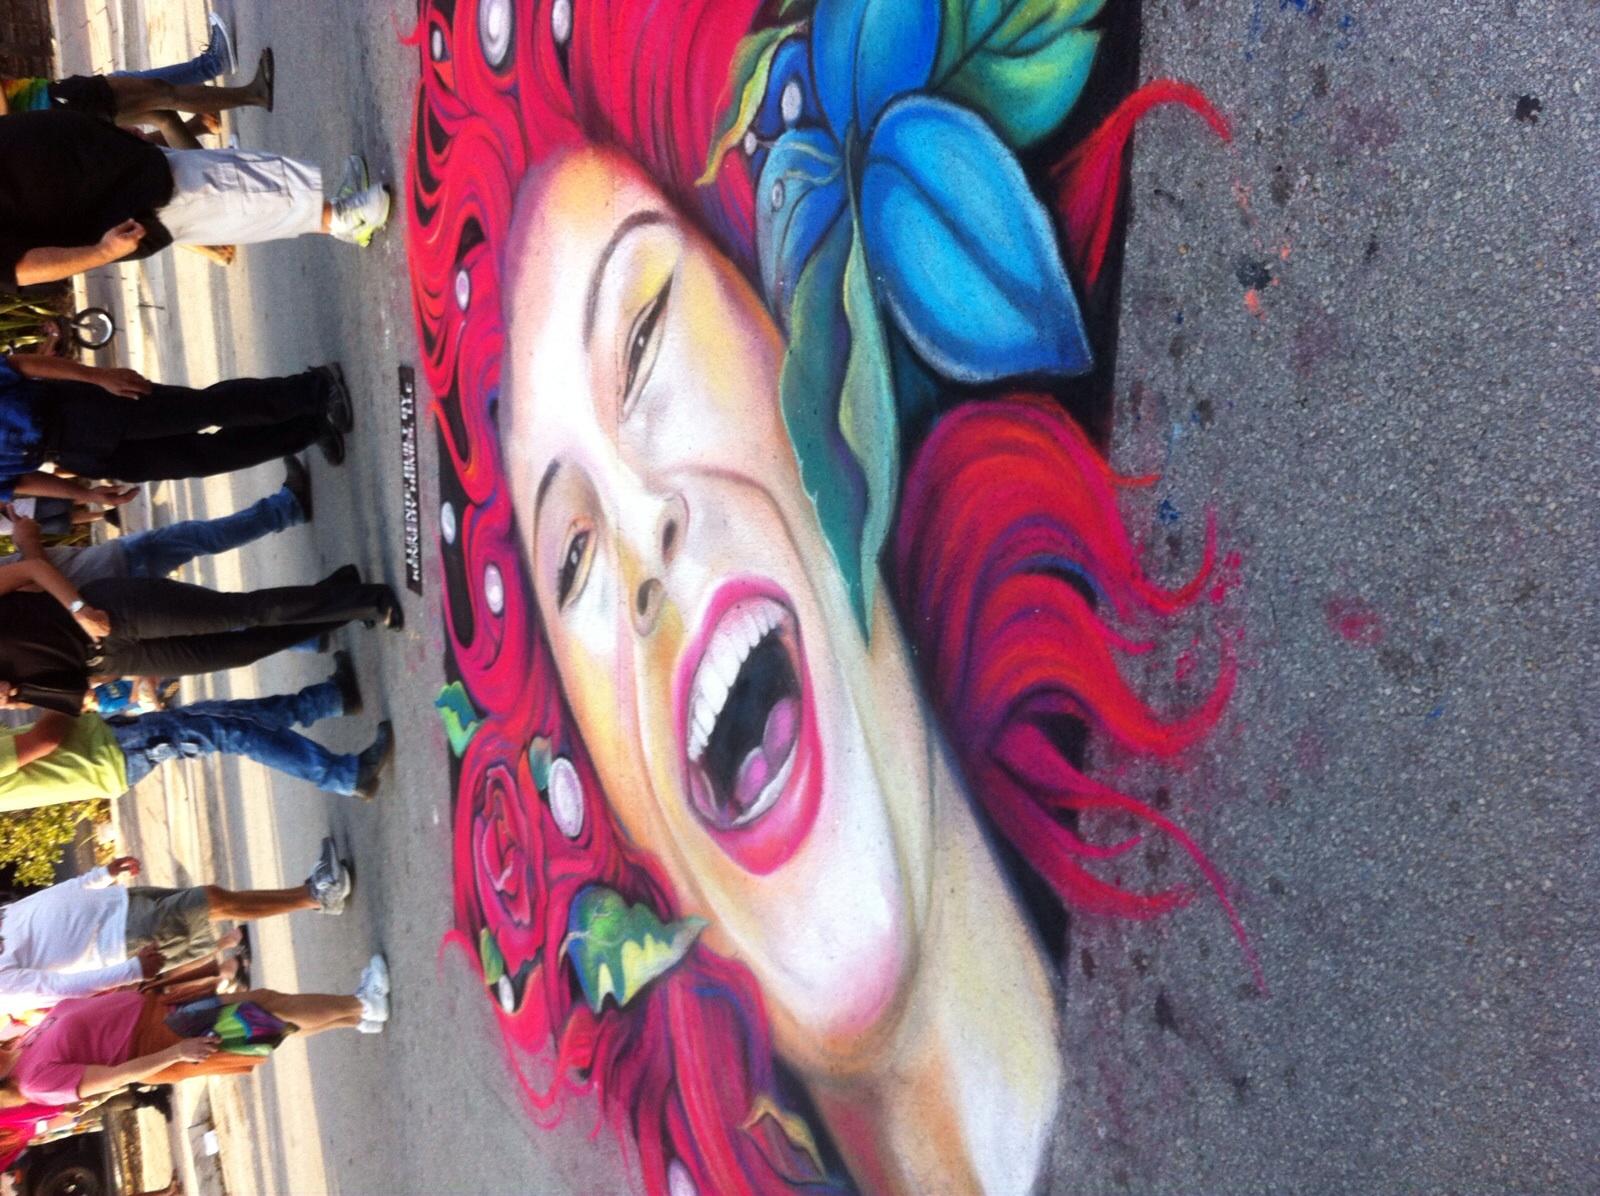 Joy by Carrie Bennett